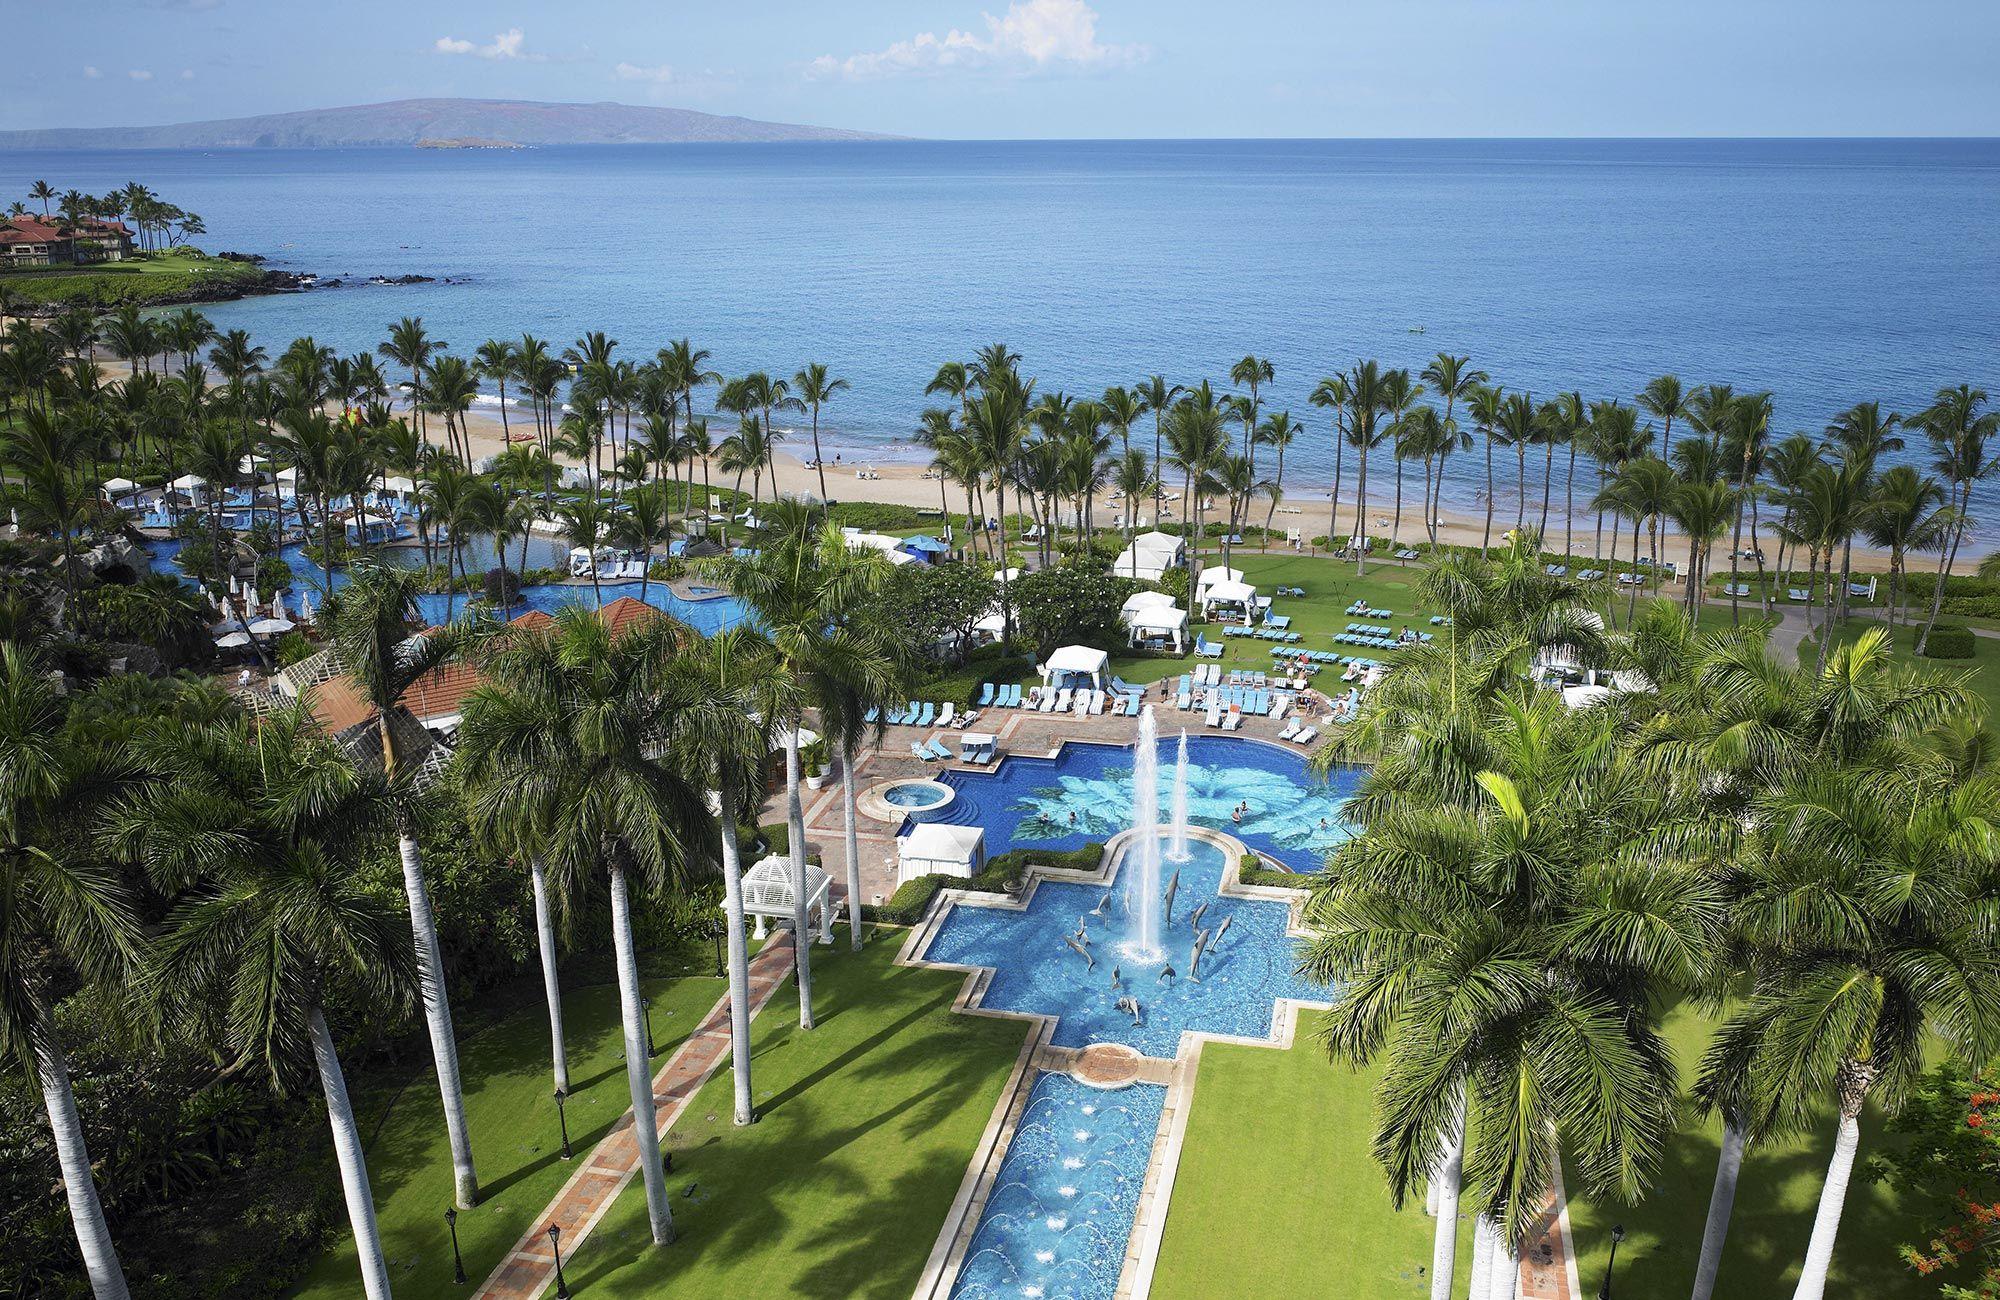 Hawaii Hotels And Resorts Grand Wailea A Waldorf Astoria Resort 1